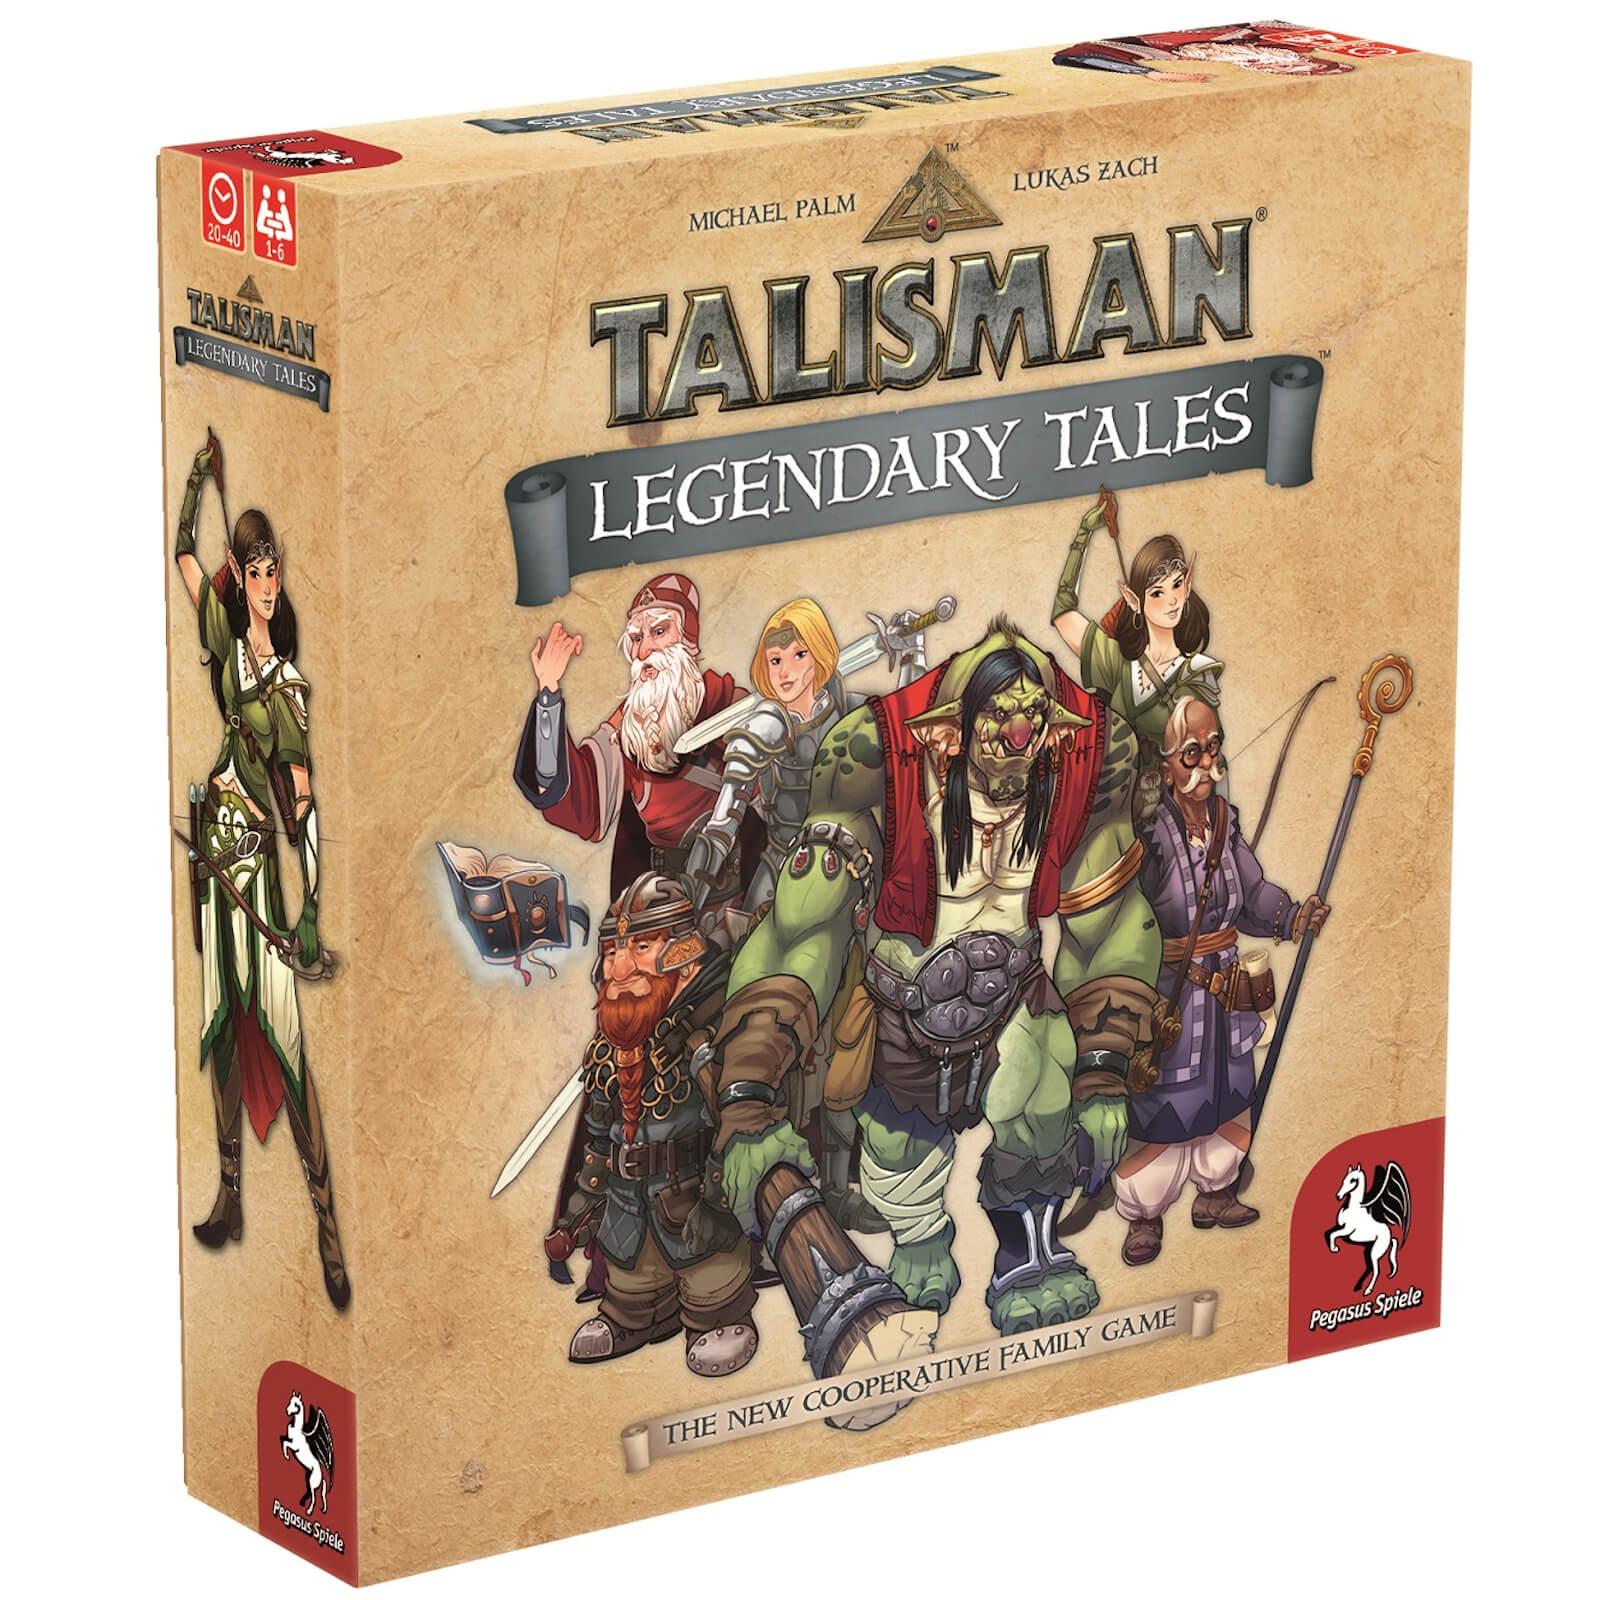 Image of Talisman Legendary Tales Board Game